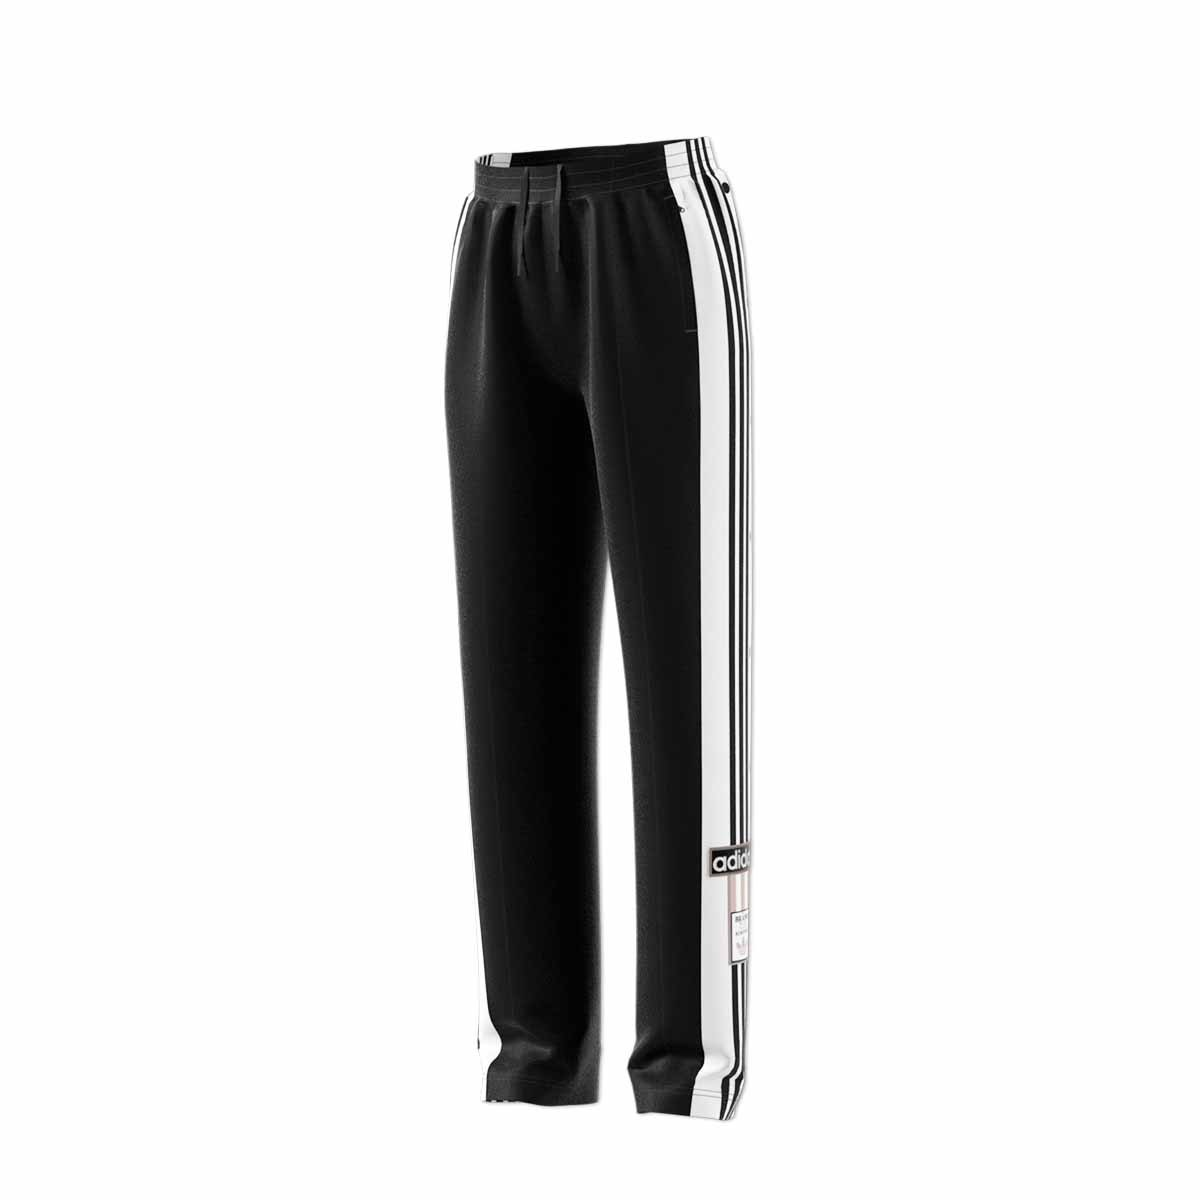 04c4860628eed pantalon adidas oriadibreak negro blanco dama deporfan. Cargando zoom.